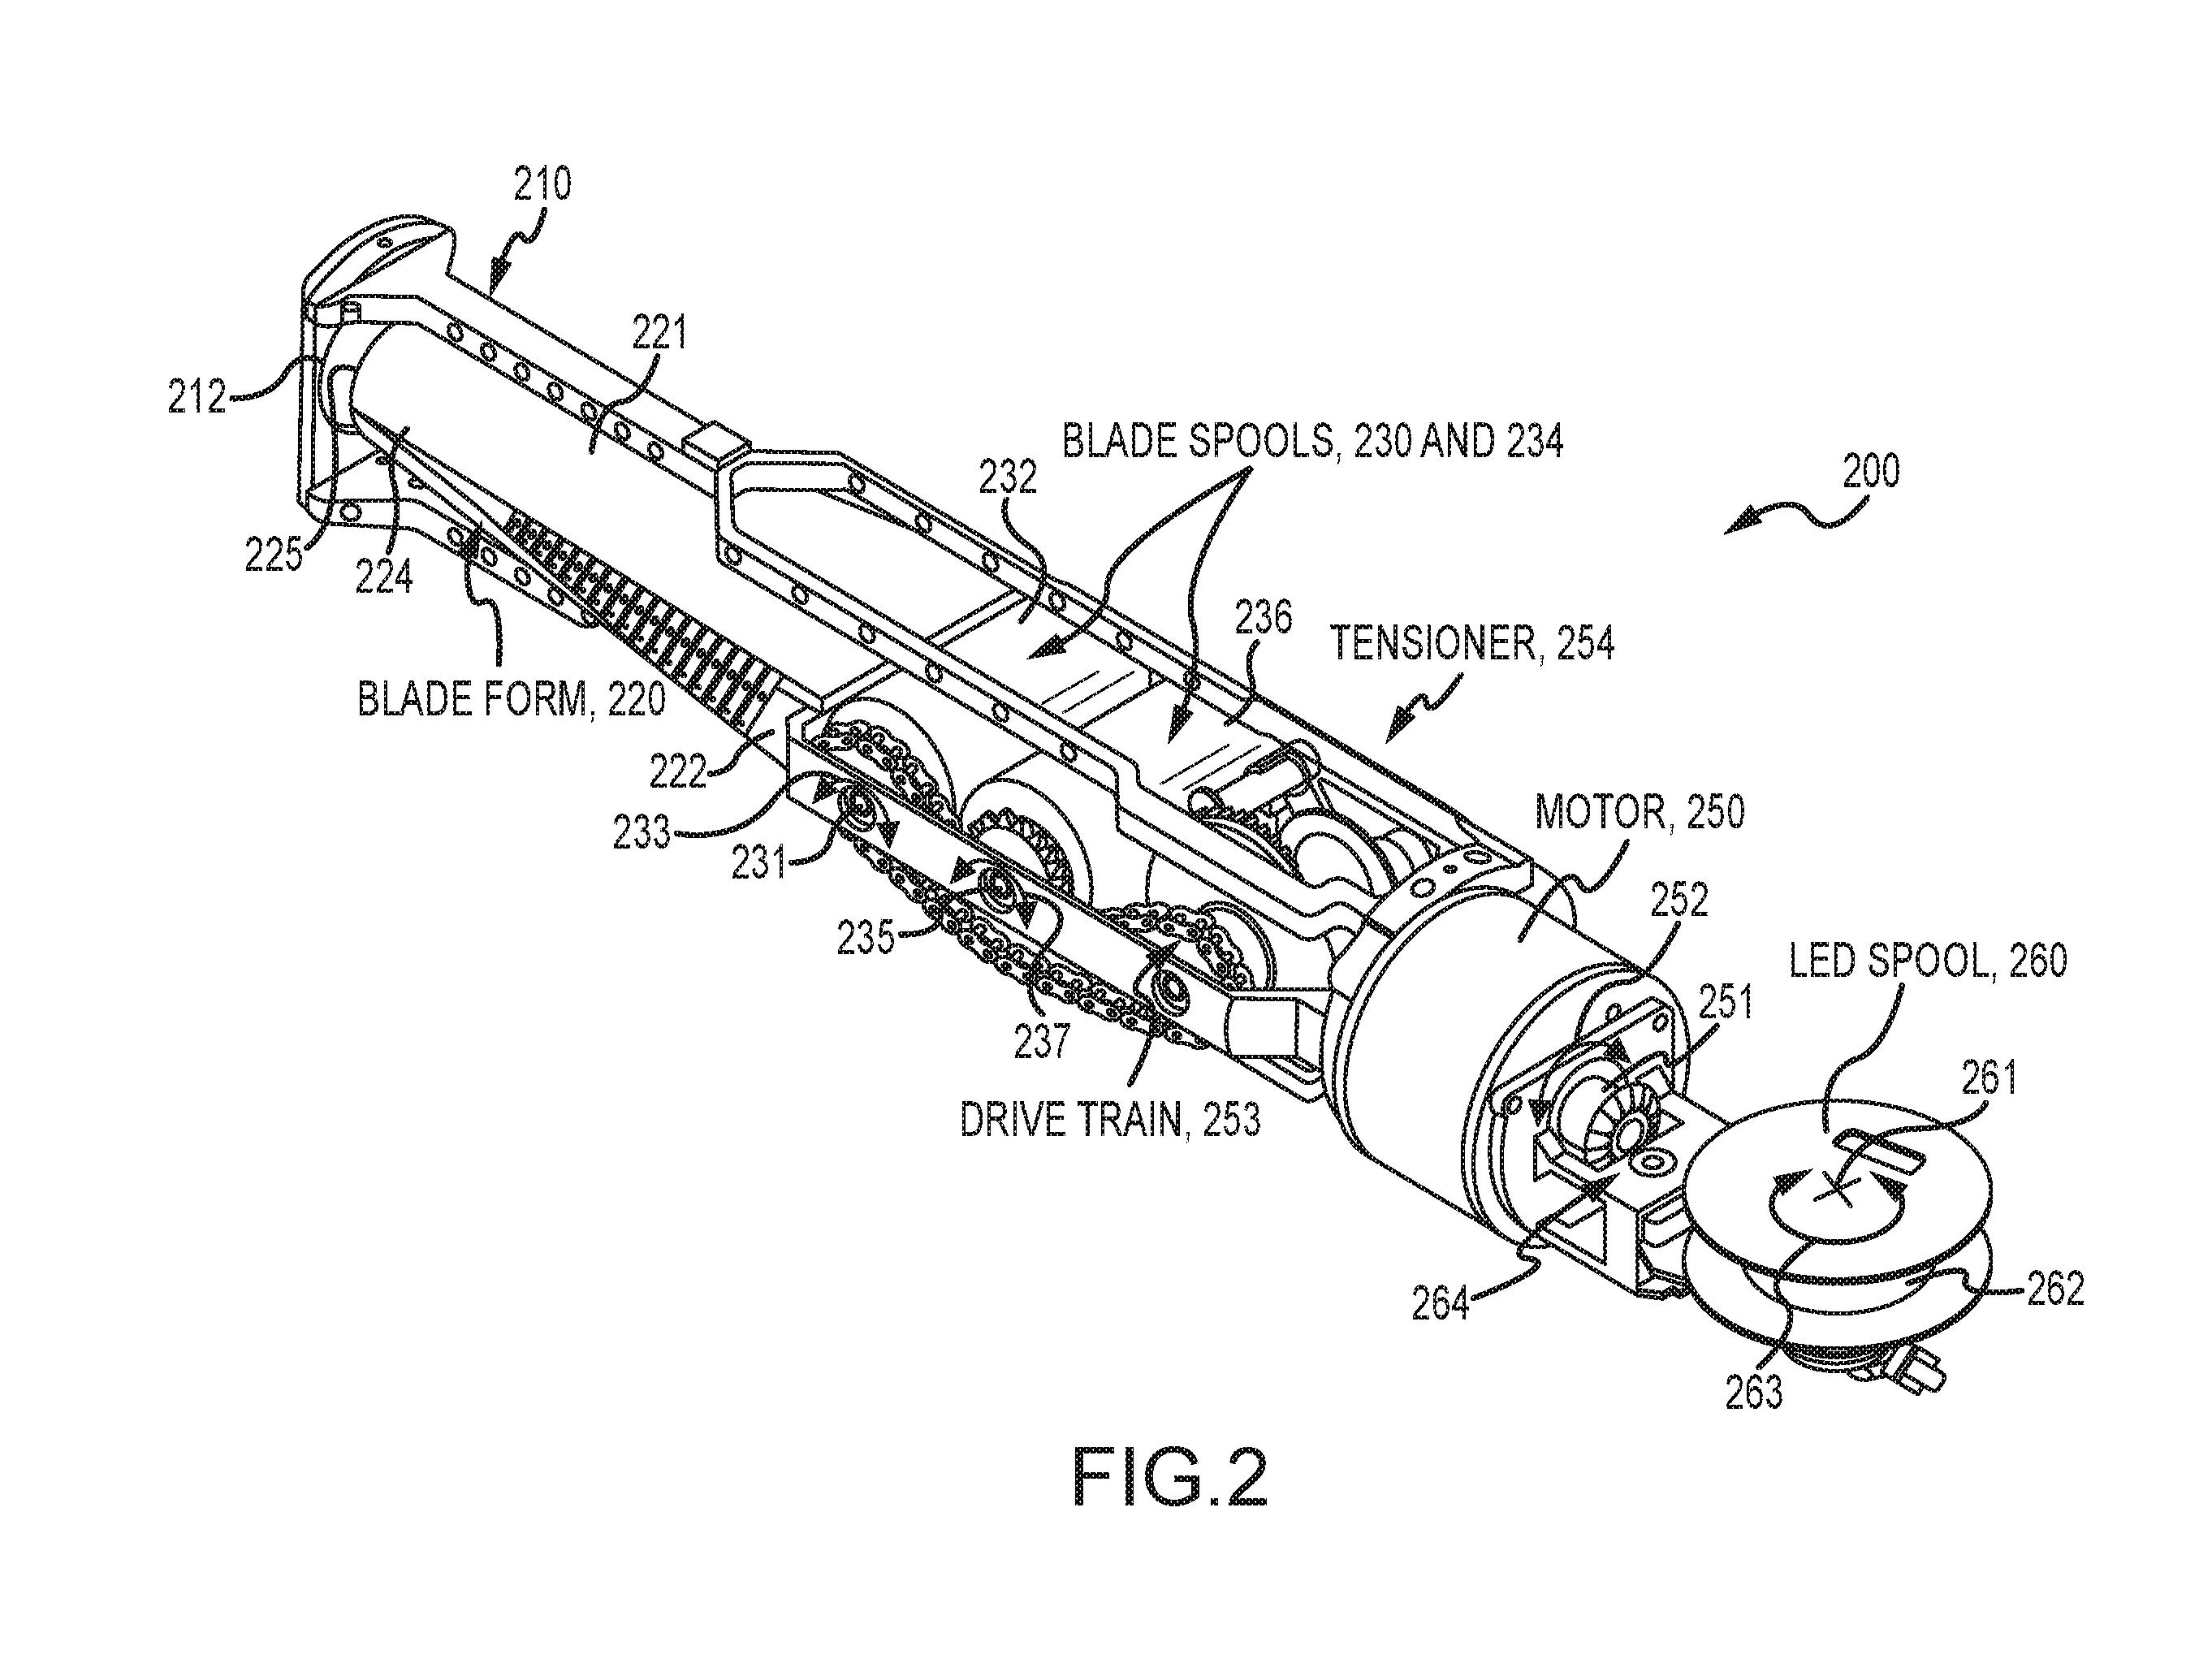 Star Wars Disney Imagineering Research Patent. US10065127B1